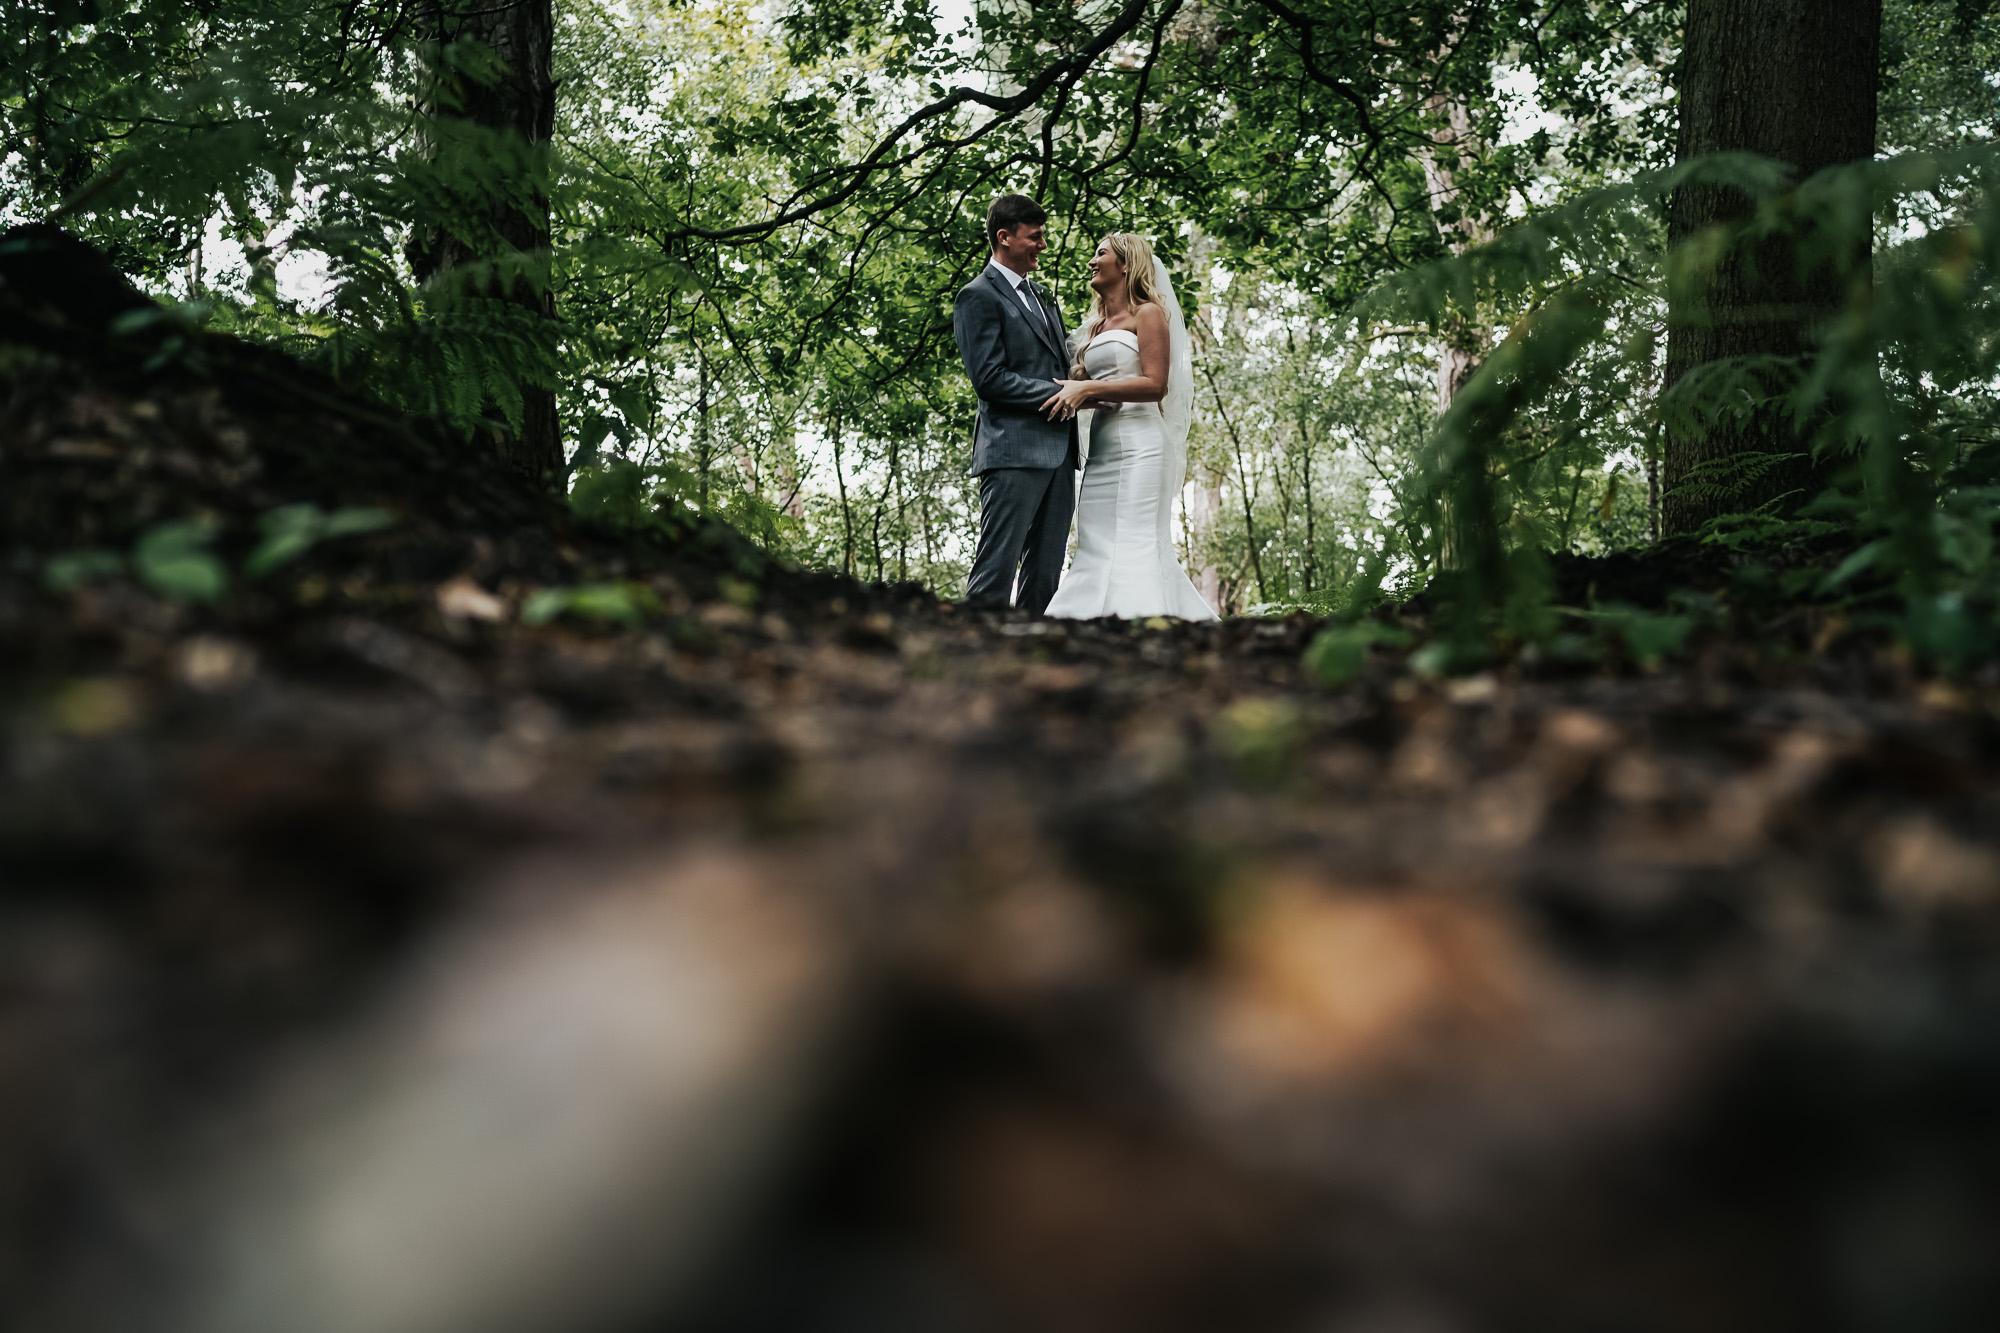 Peckforton Castle wedding photography cheshire wedding photographer (44 of 57).jpg